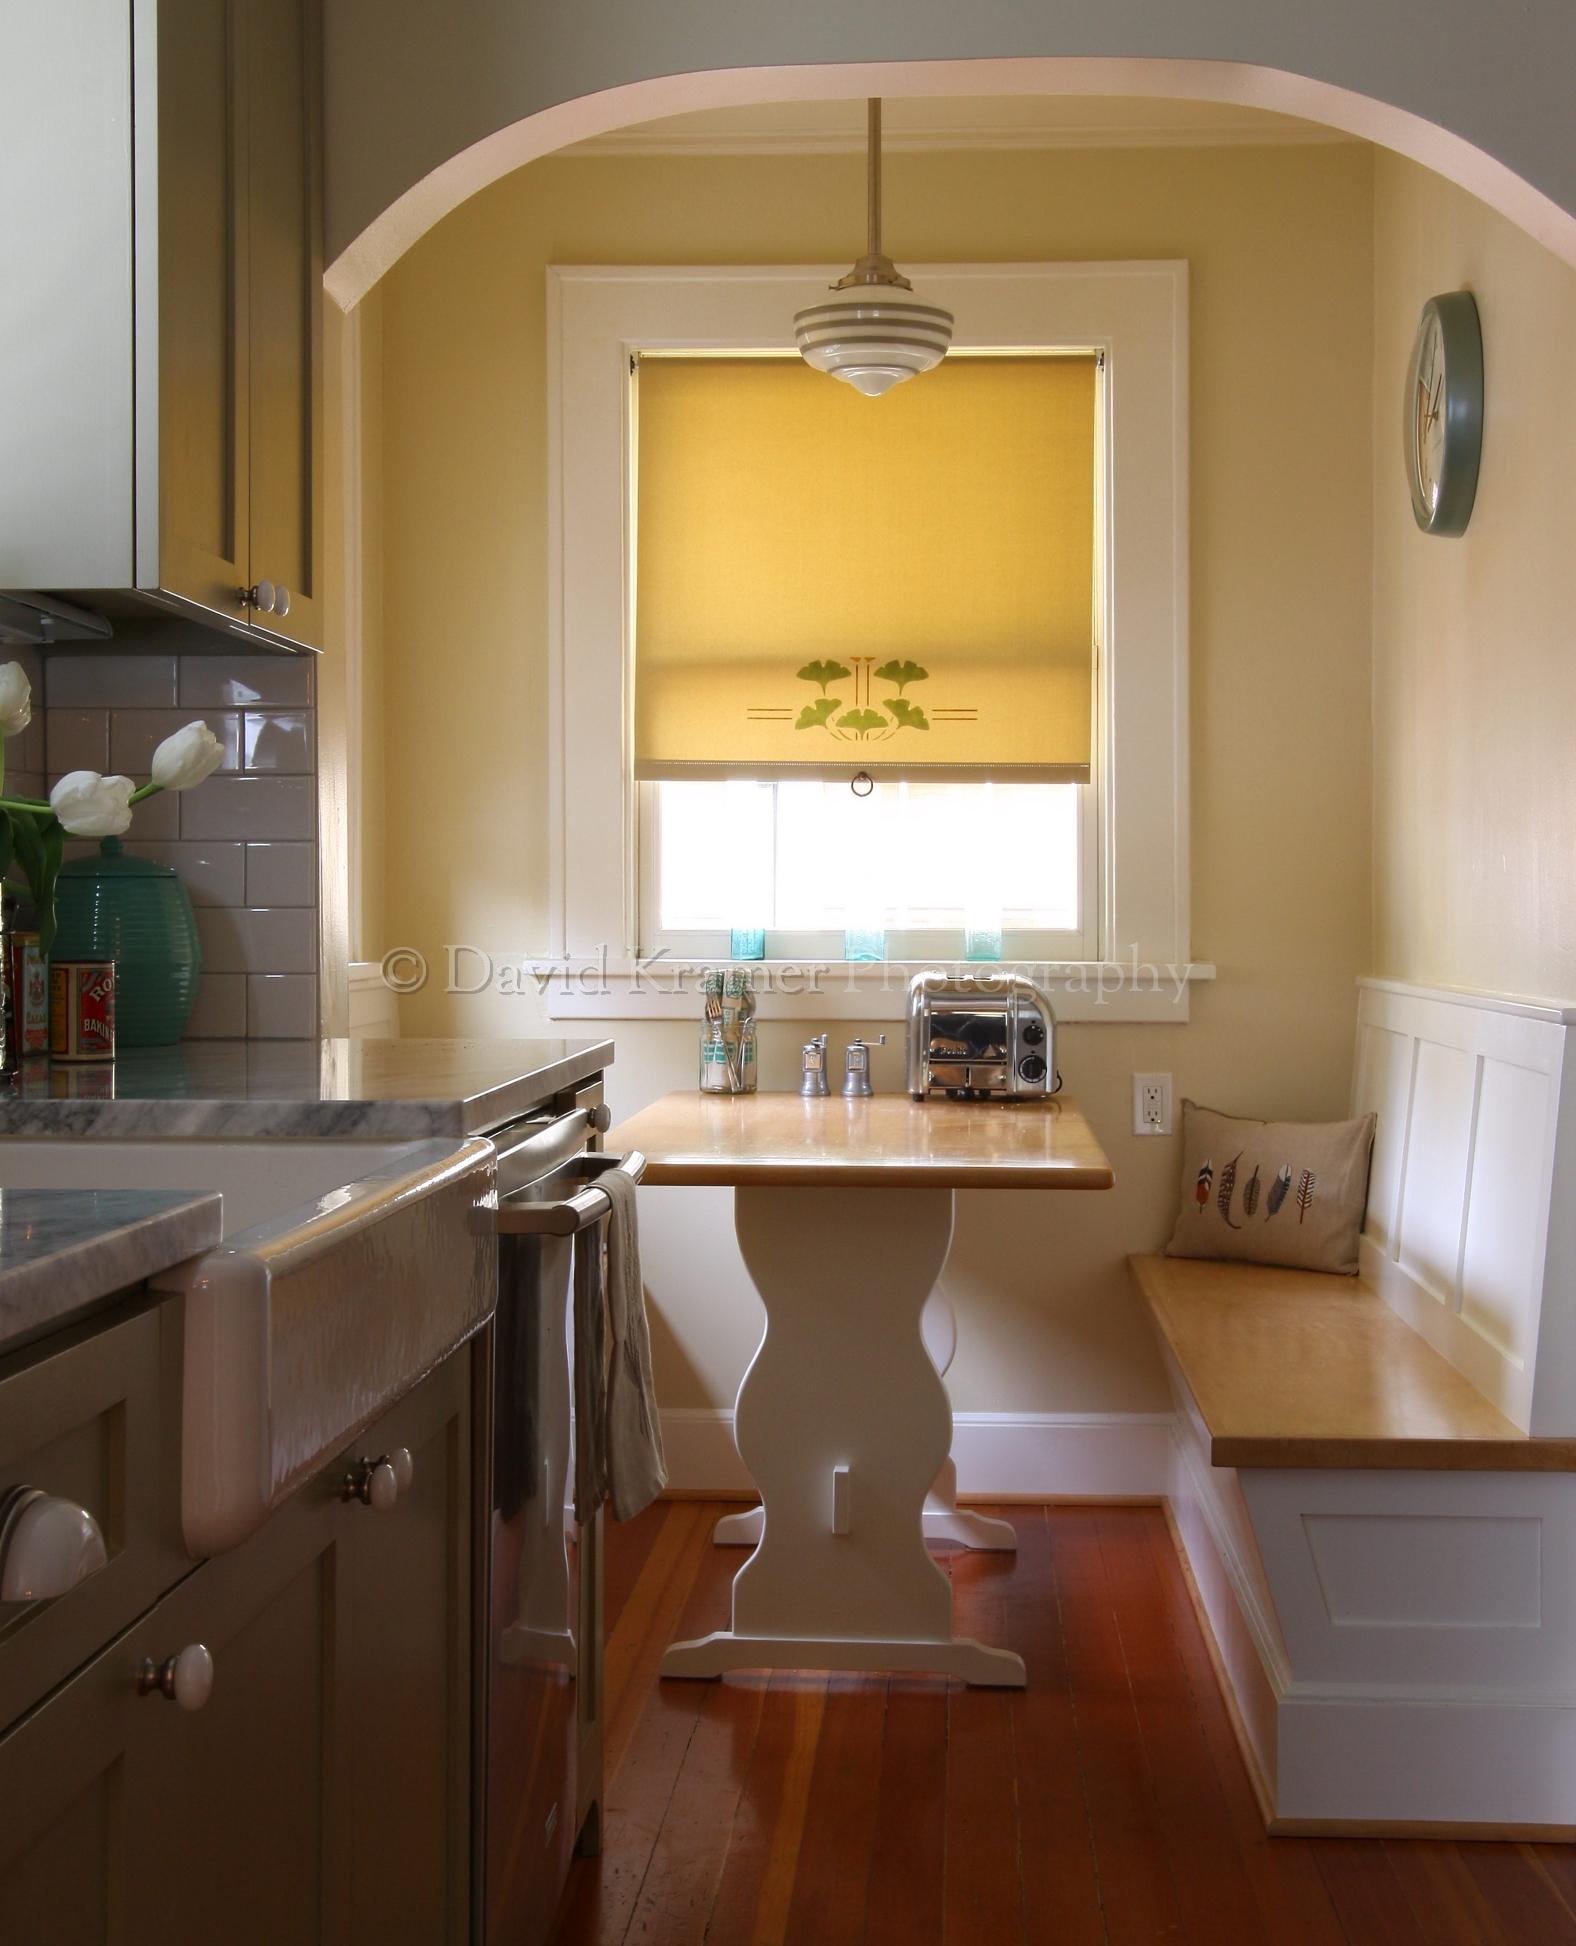 Walton-Kitchen-BrkfstNook-AB-Kramer-IMG_6760a.jpg